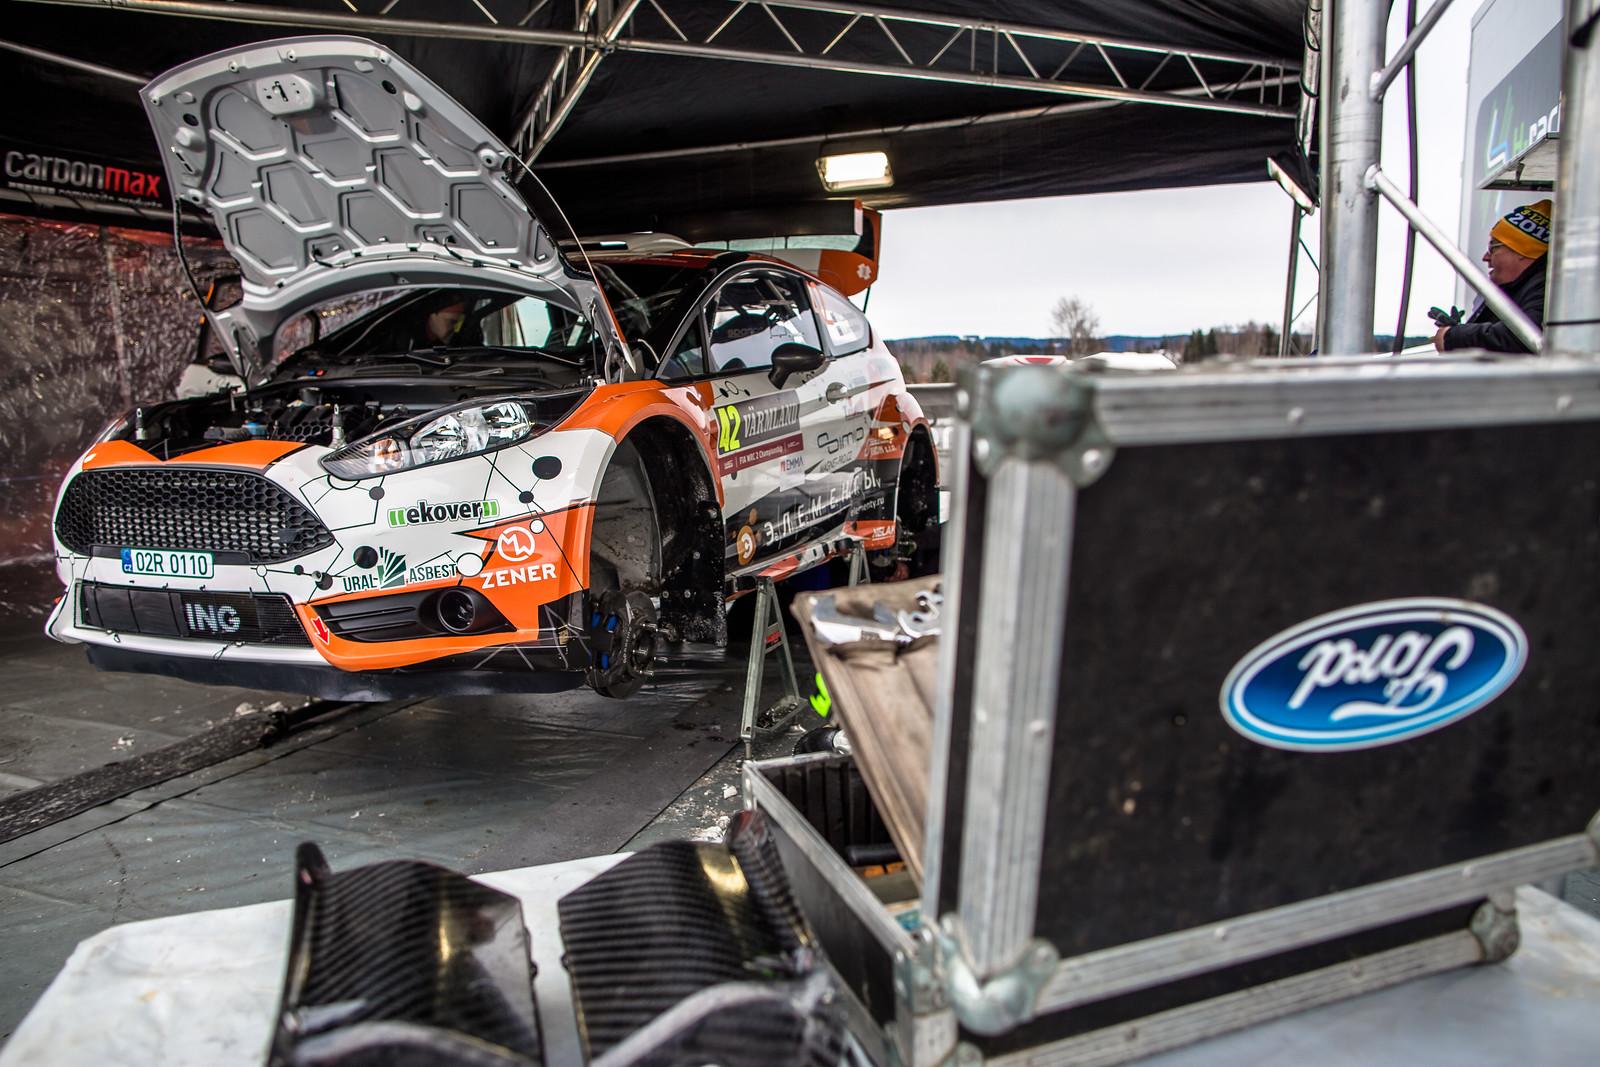 photo: h-Racing